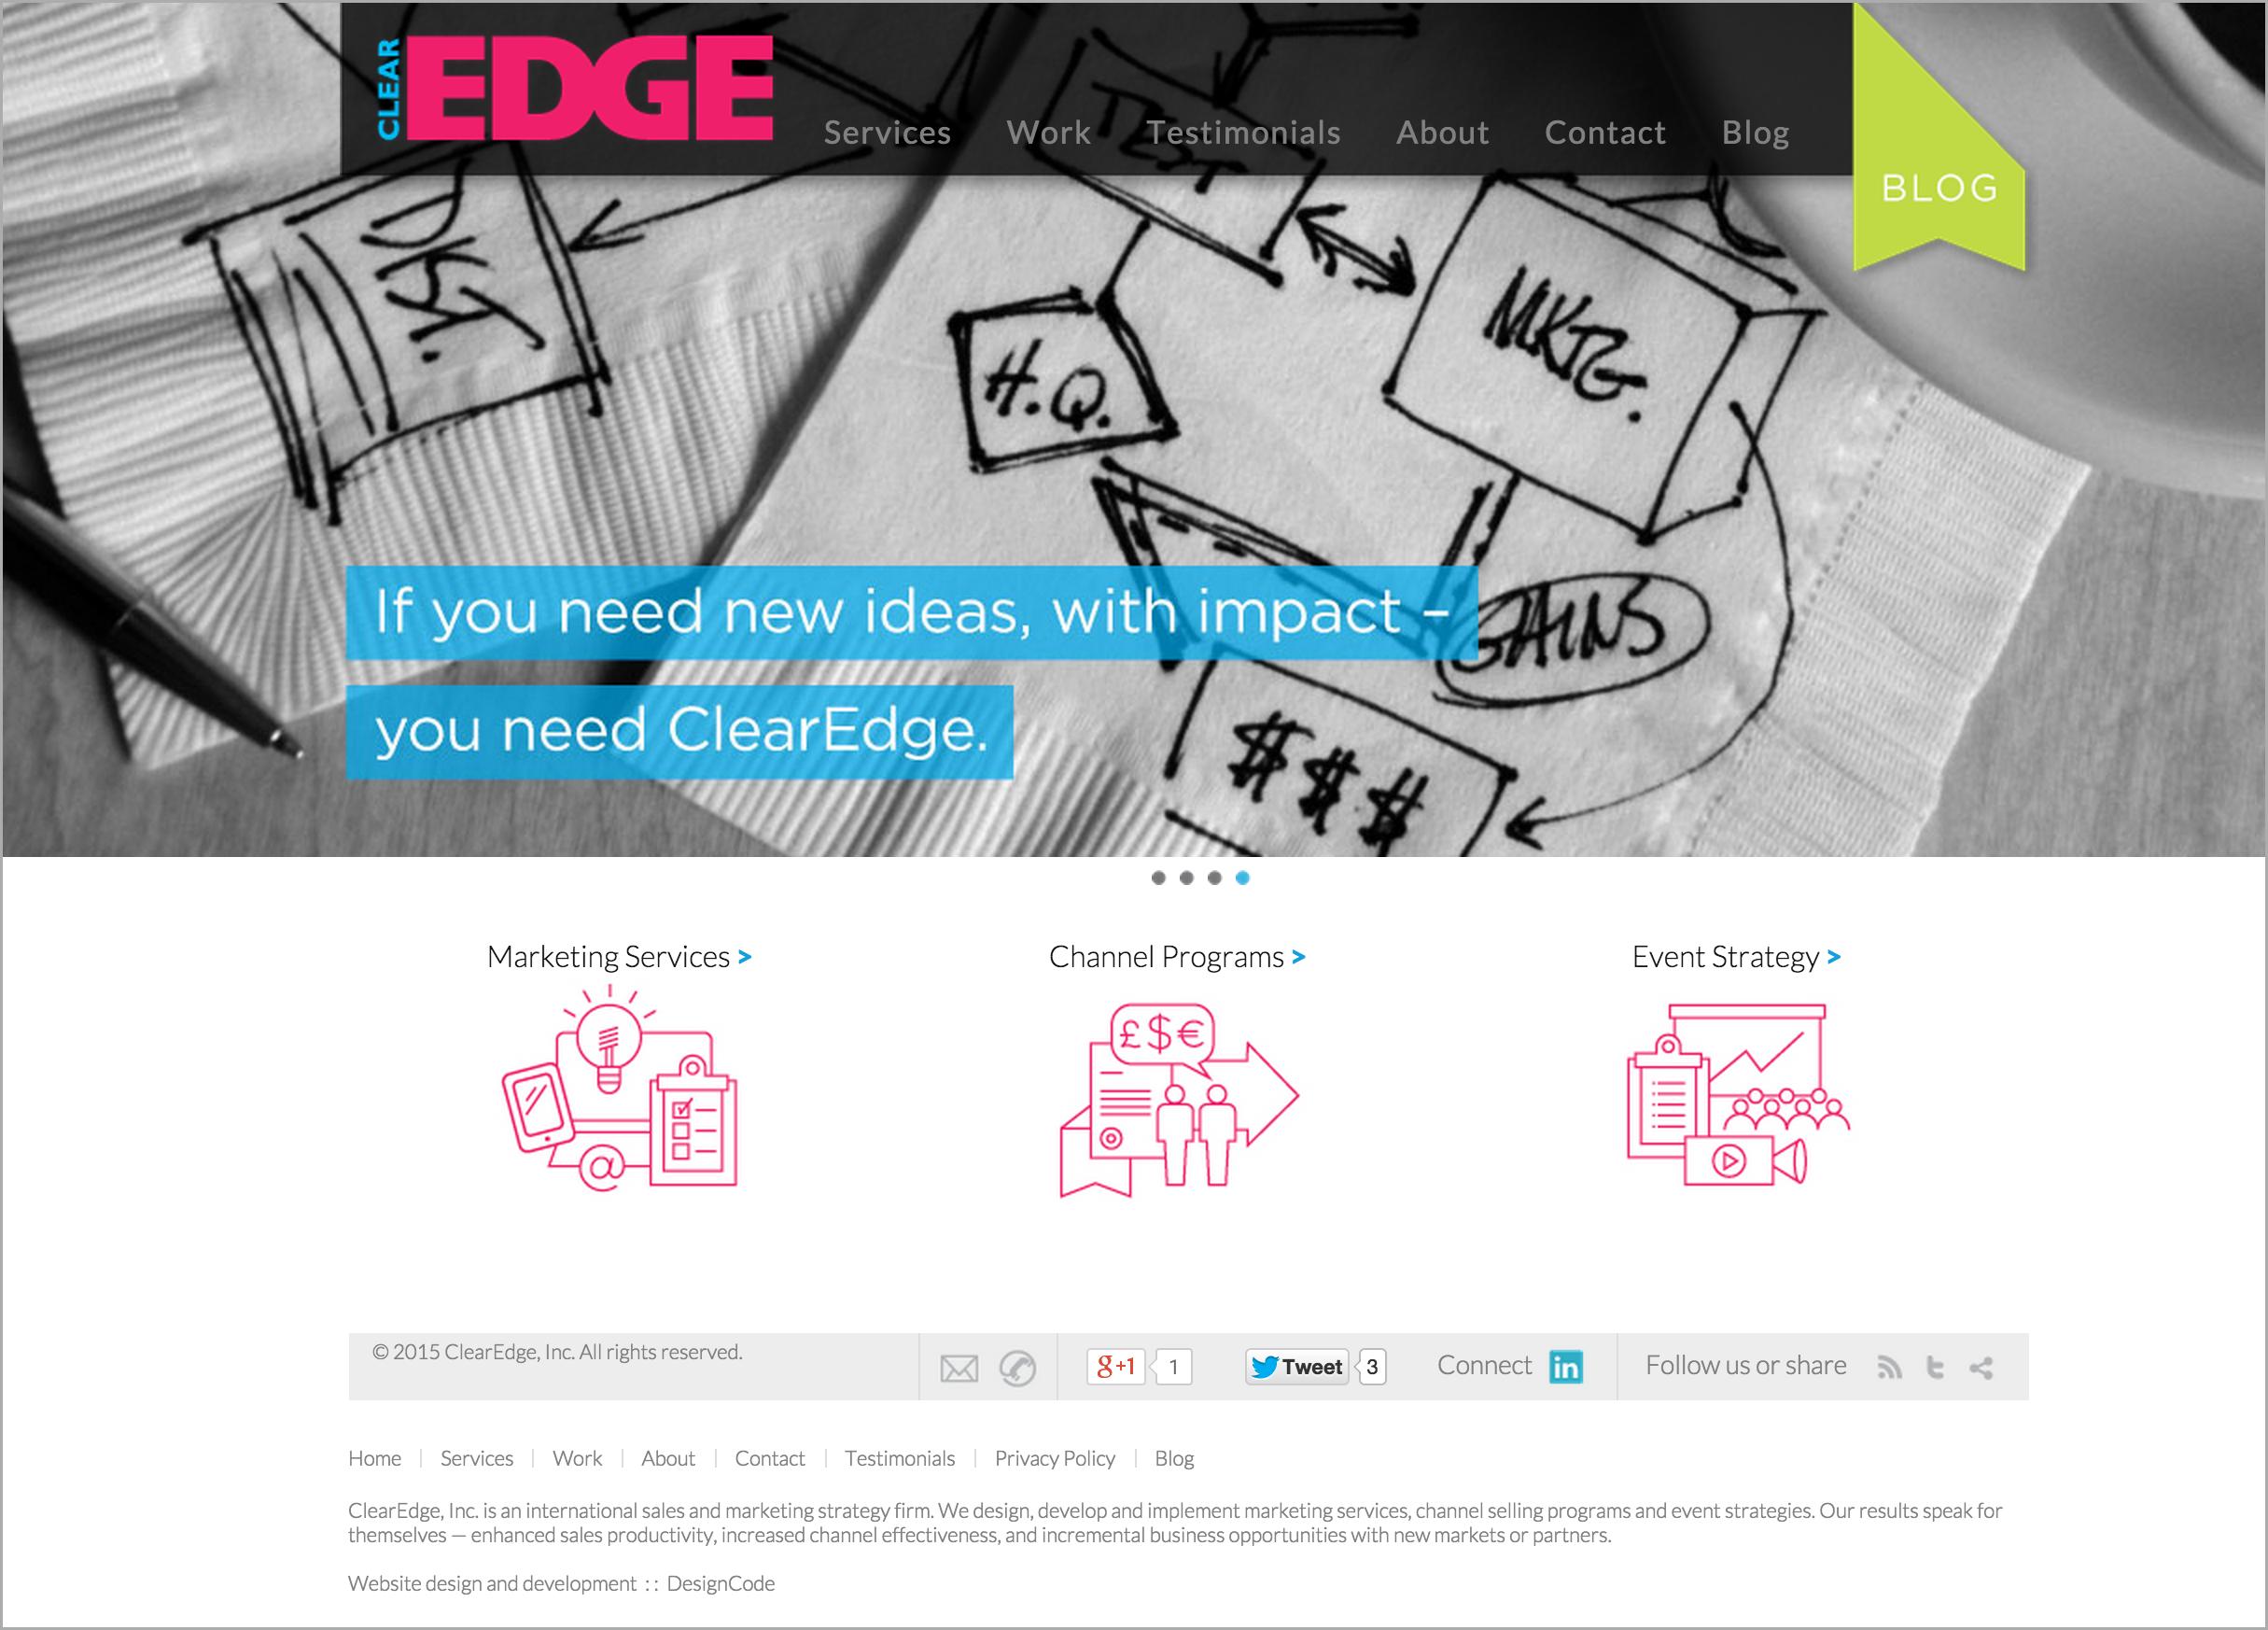 ClearEdge Inc. Website Design | DesignCode | Austin, Texas